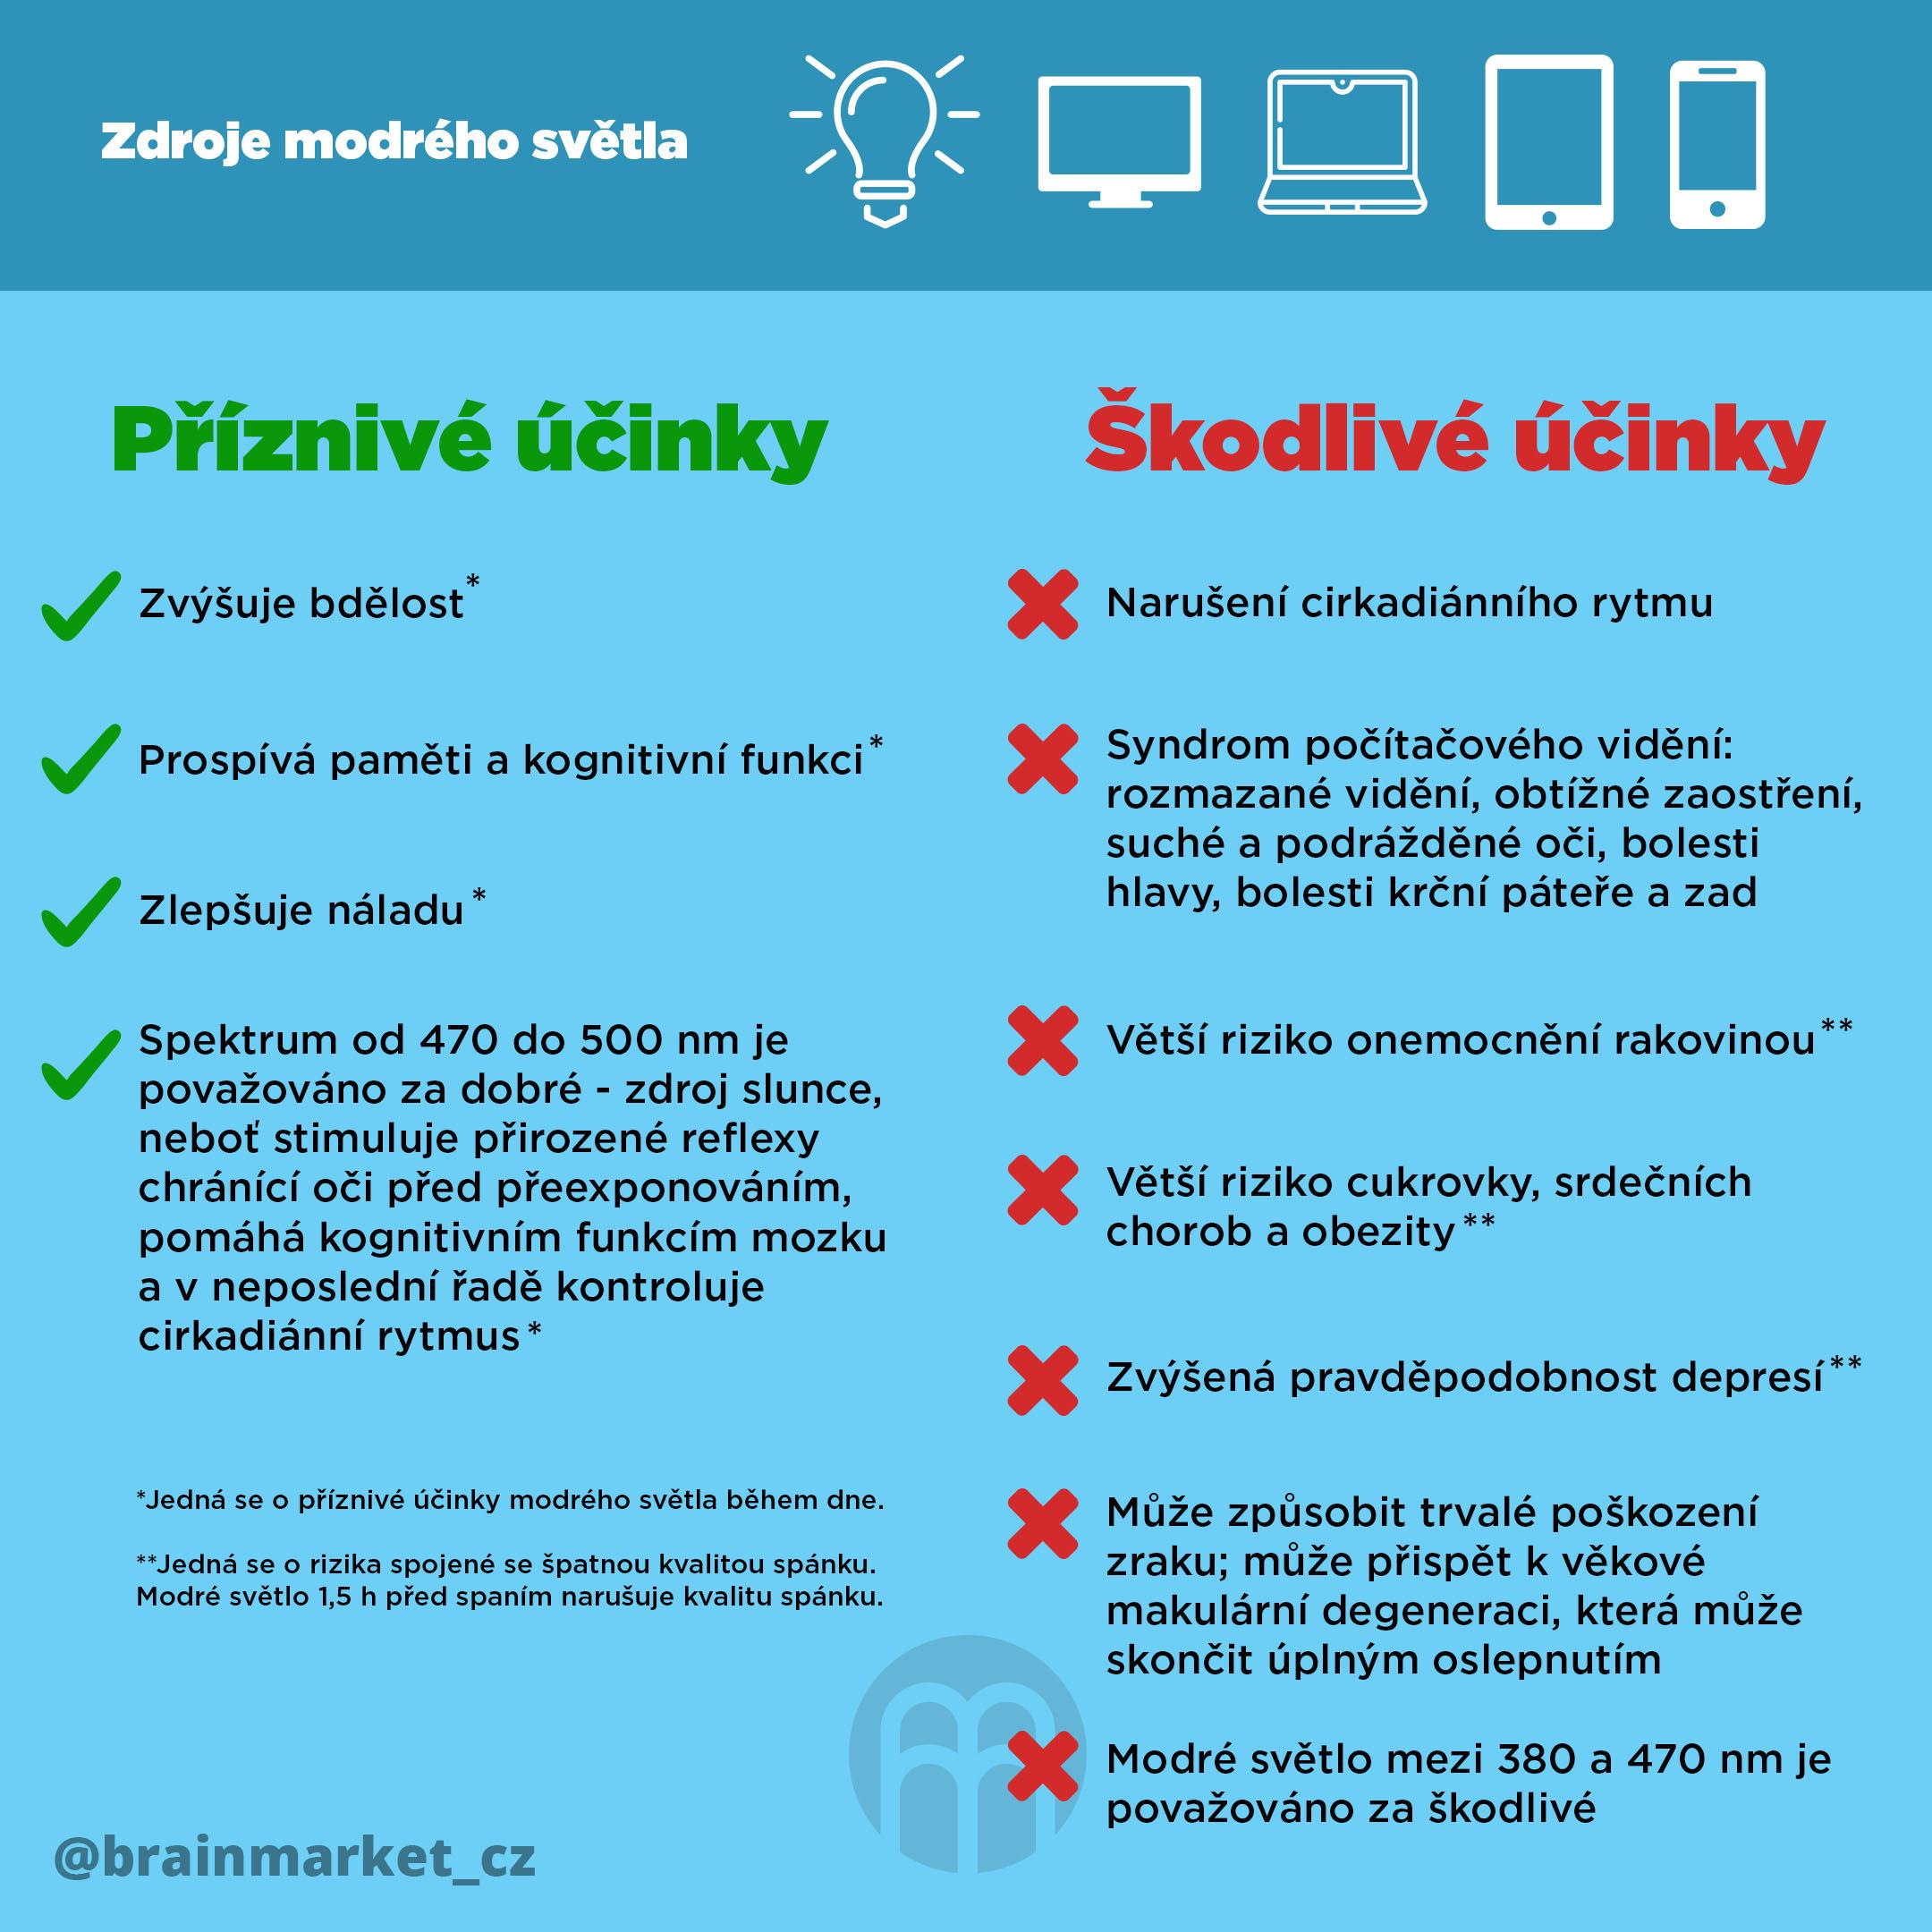 zdroje-modreho-svetla-infografika-instagram-brainmarket-update